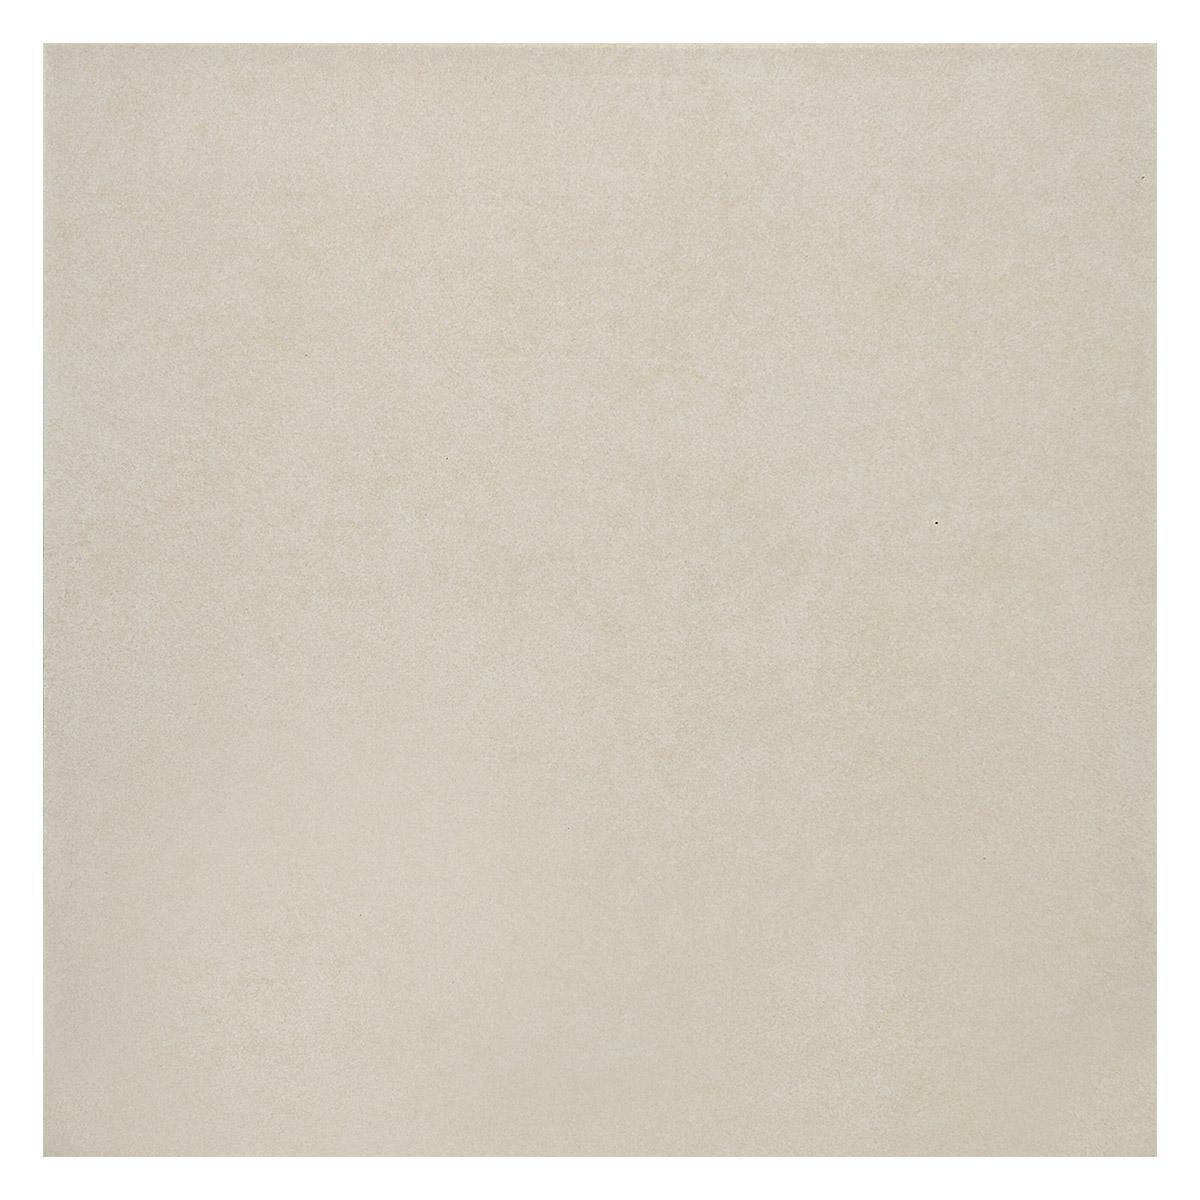 Mayólica Lounge Blanco/Gris Mate - 47X47 cm - 2.43 m2